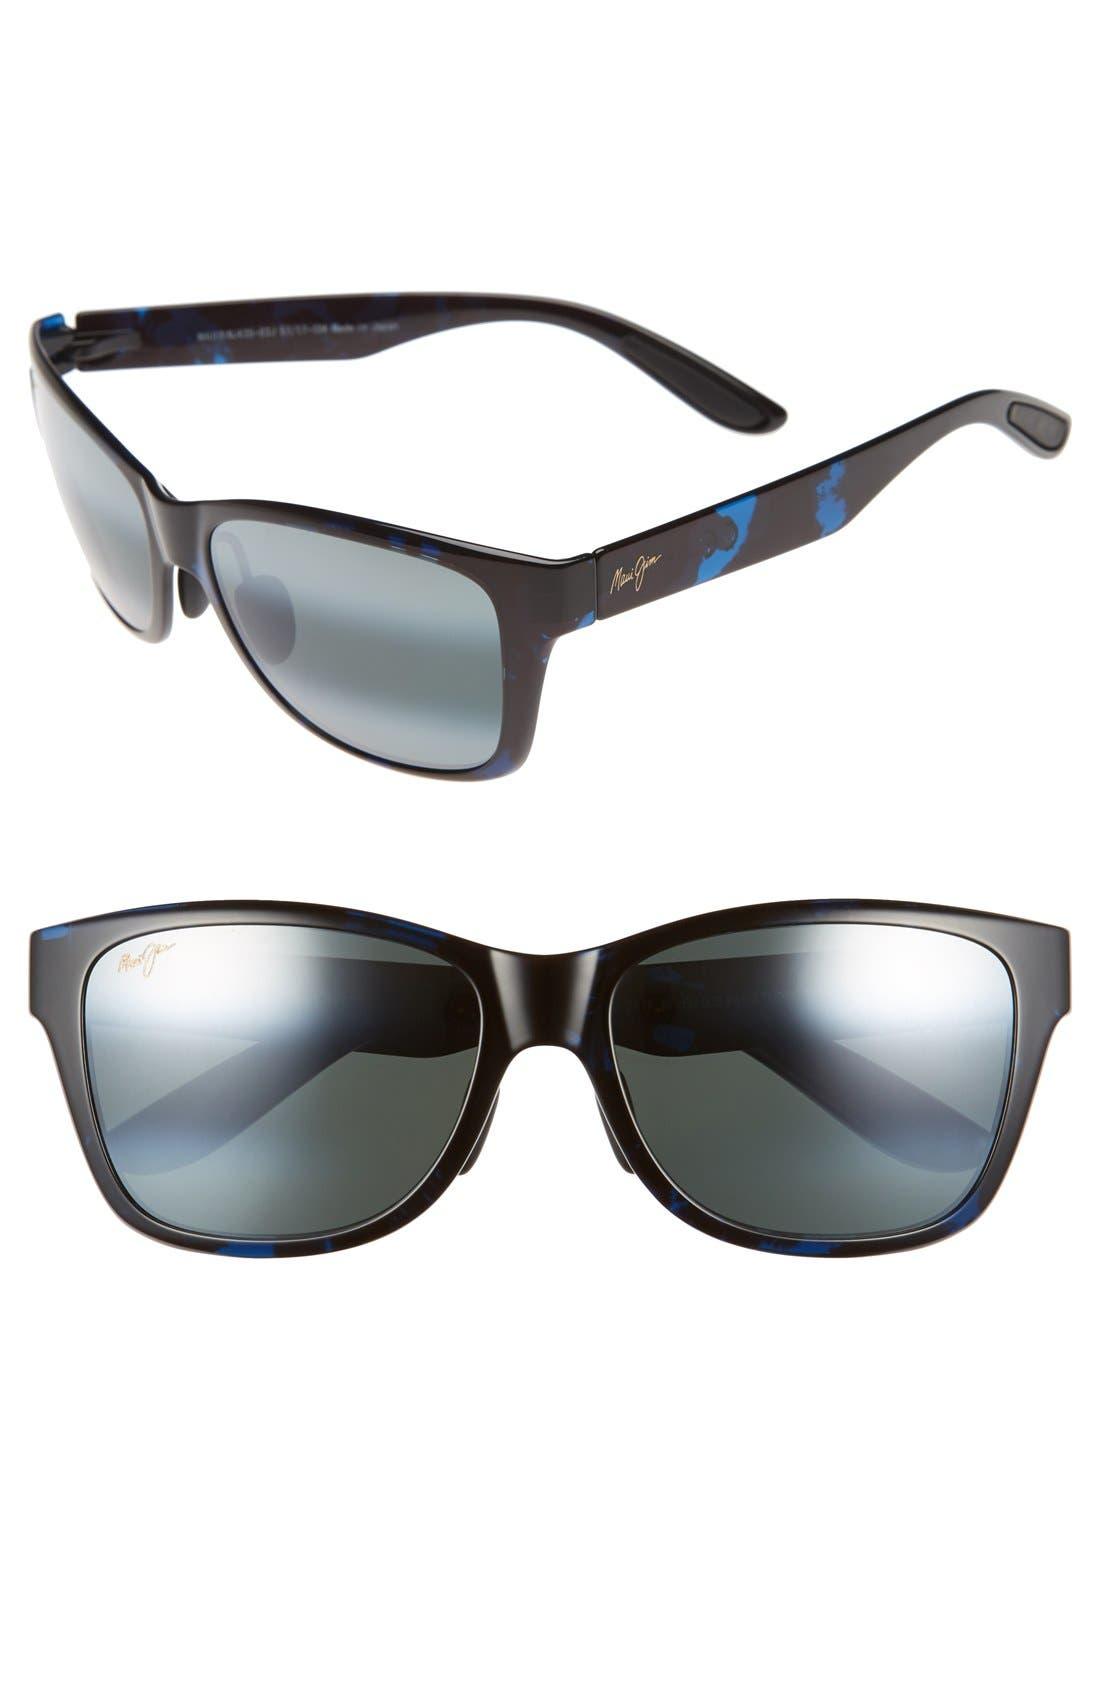 'Road Trip' 57mm Polarized Sunglasses,                             Main thumbnail 1, color,                             BLUE AND BLACK TORTOISE/GREY